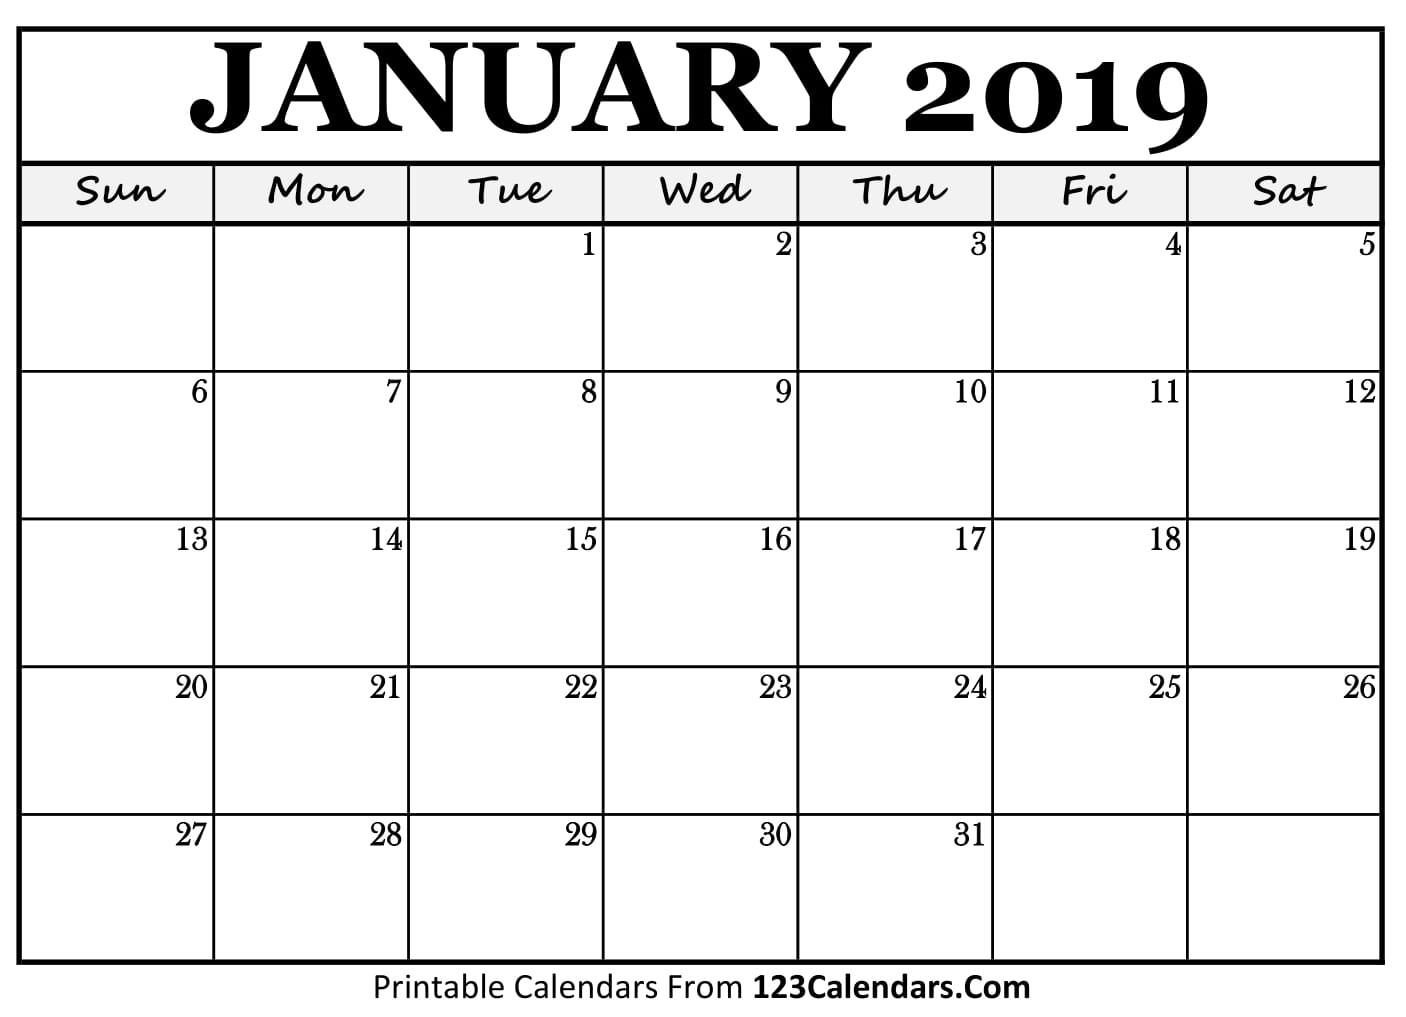 2019 Printable Calendar Template 2019 Printable Calendar 123calendars